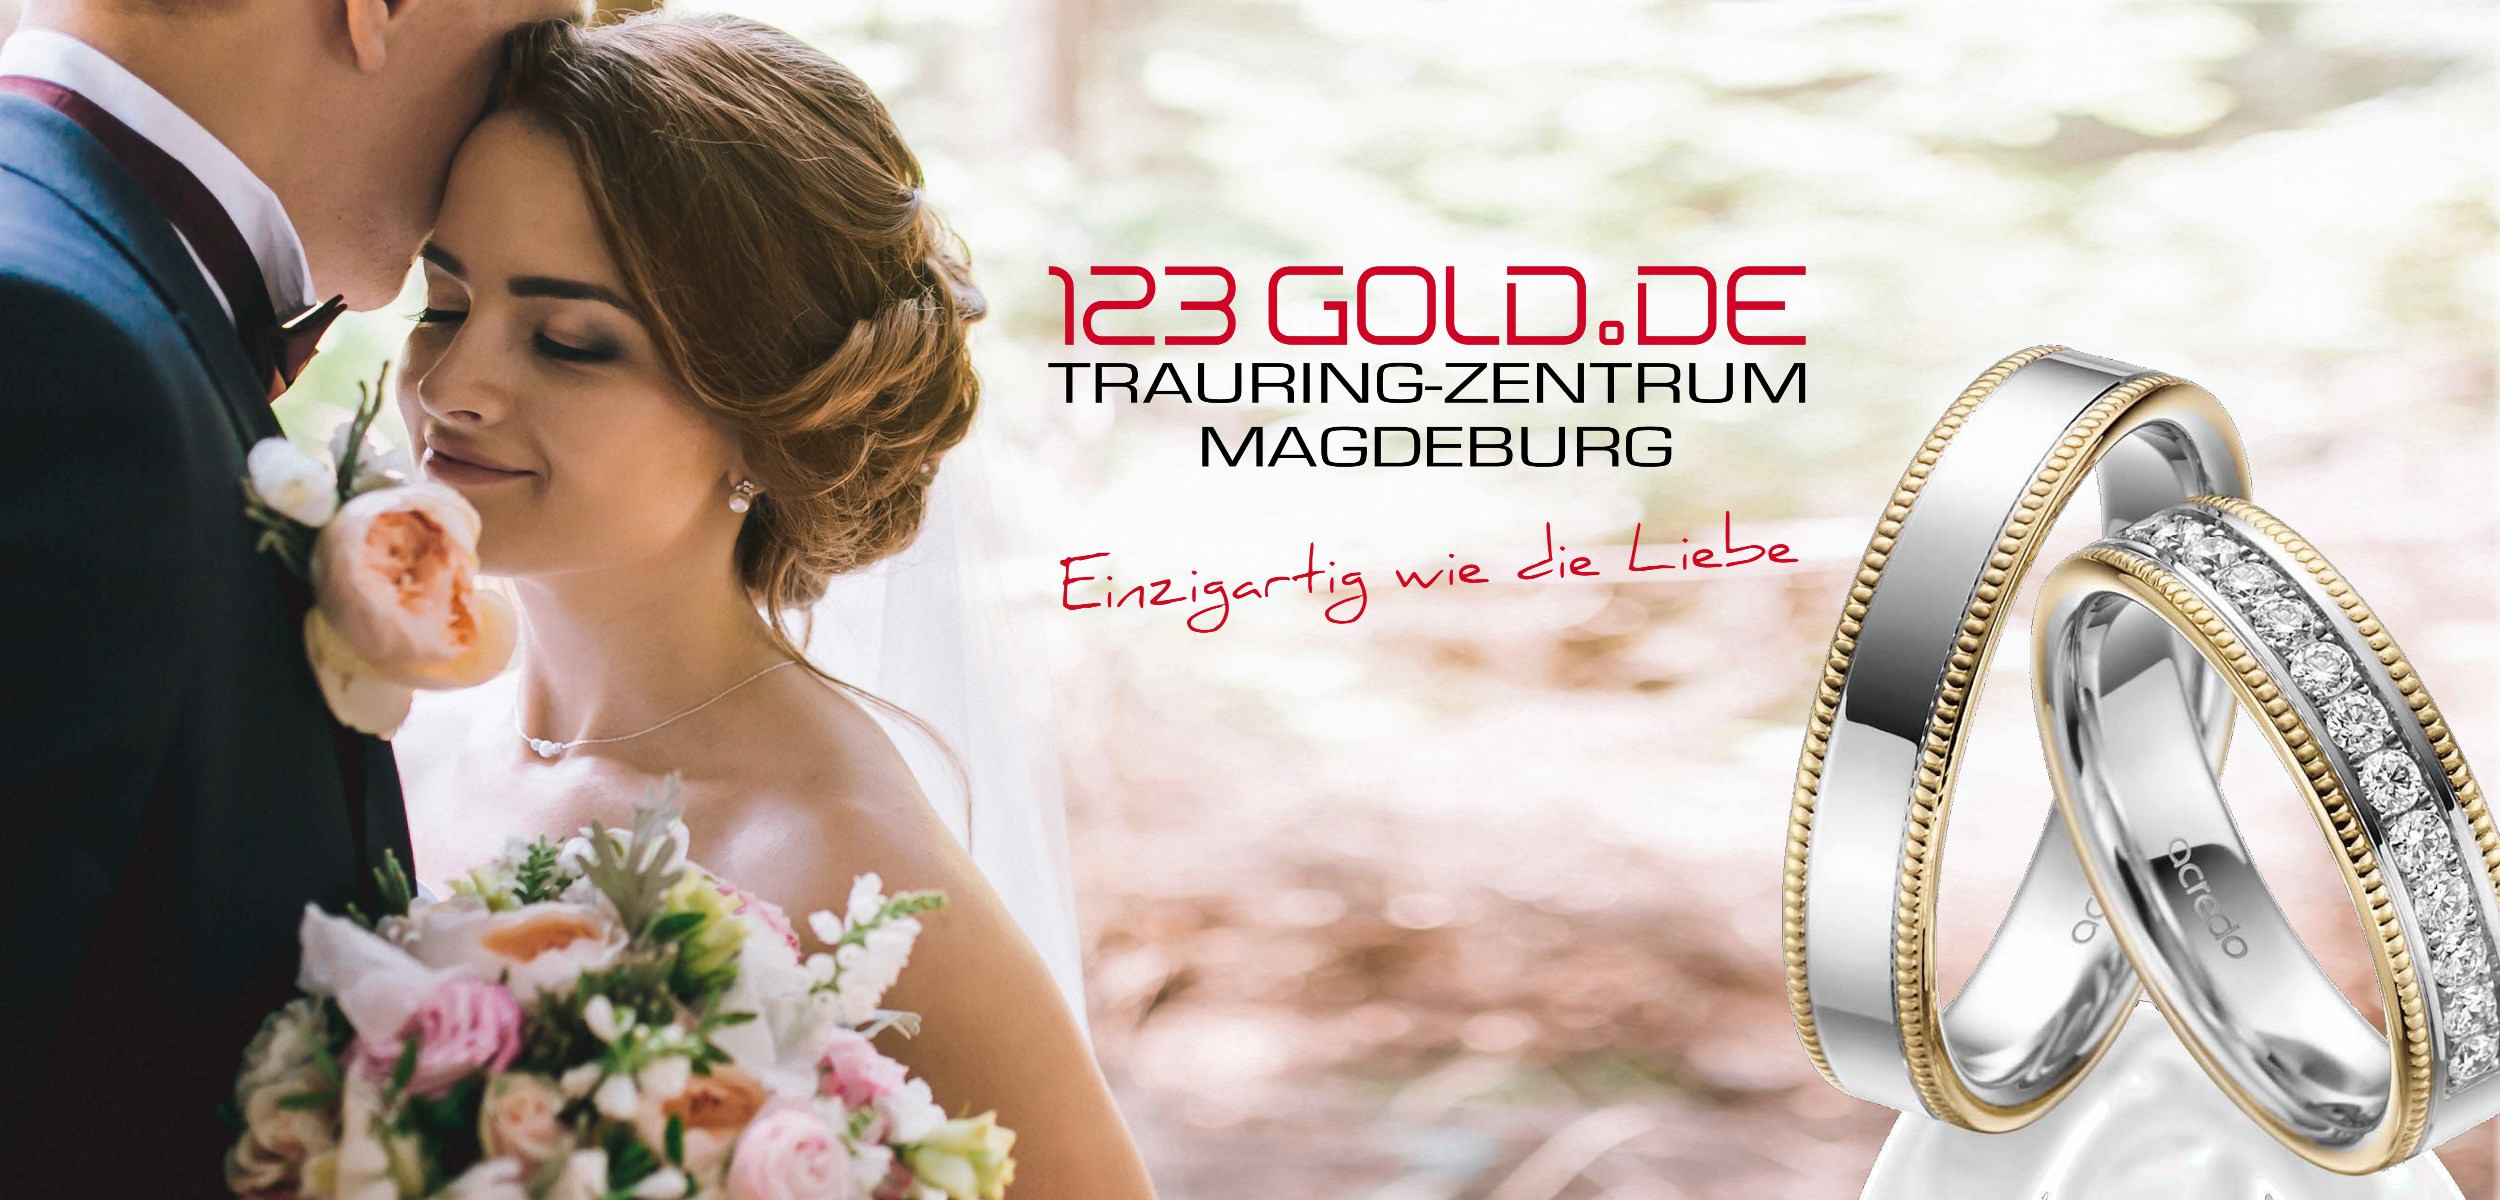 123 Gold Magdeburg